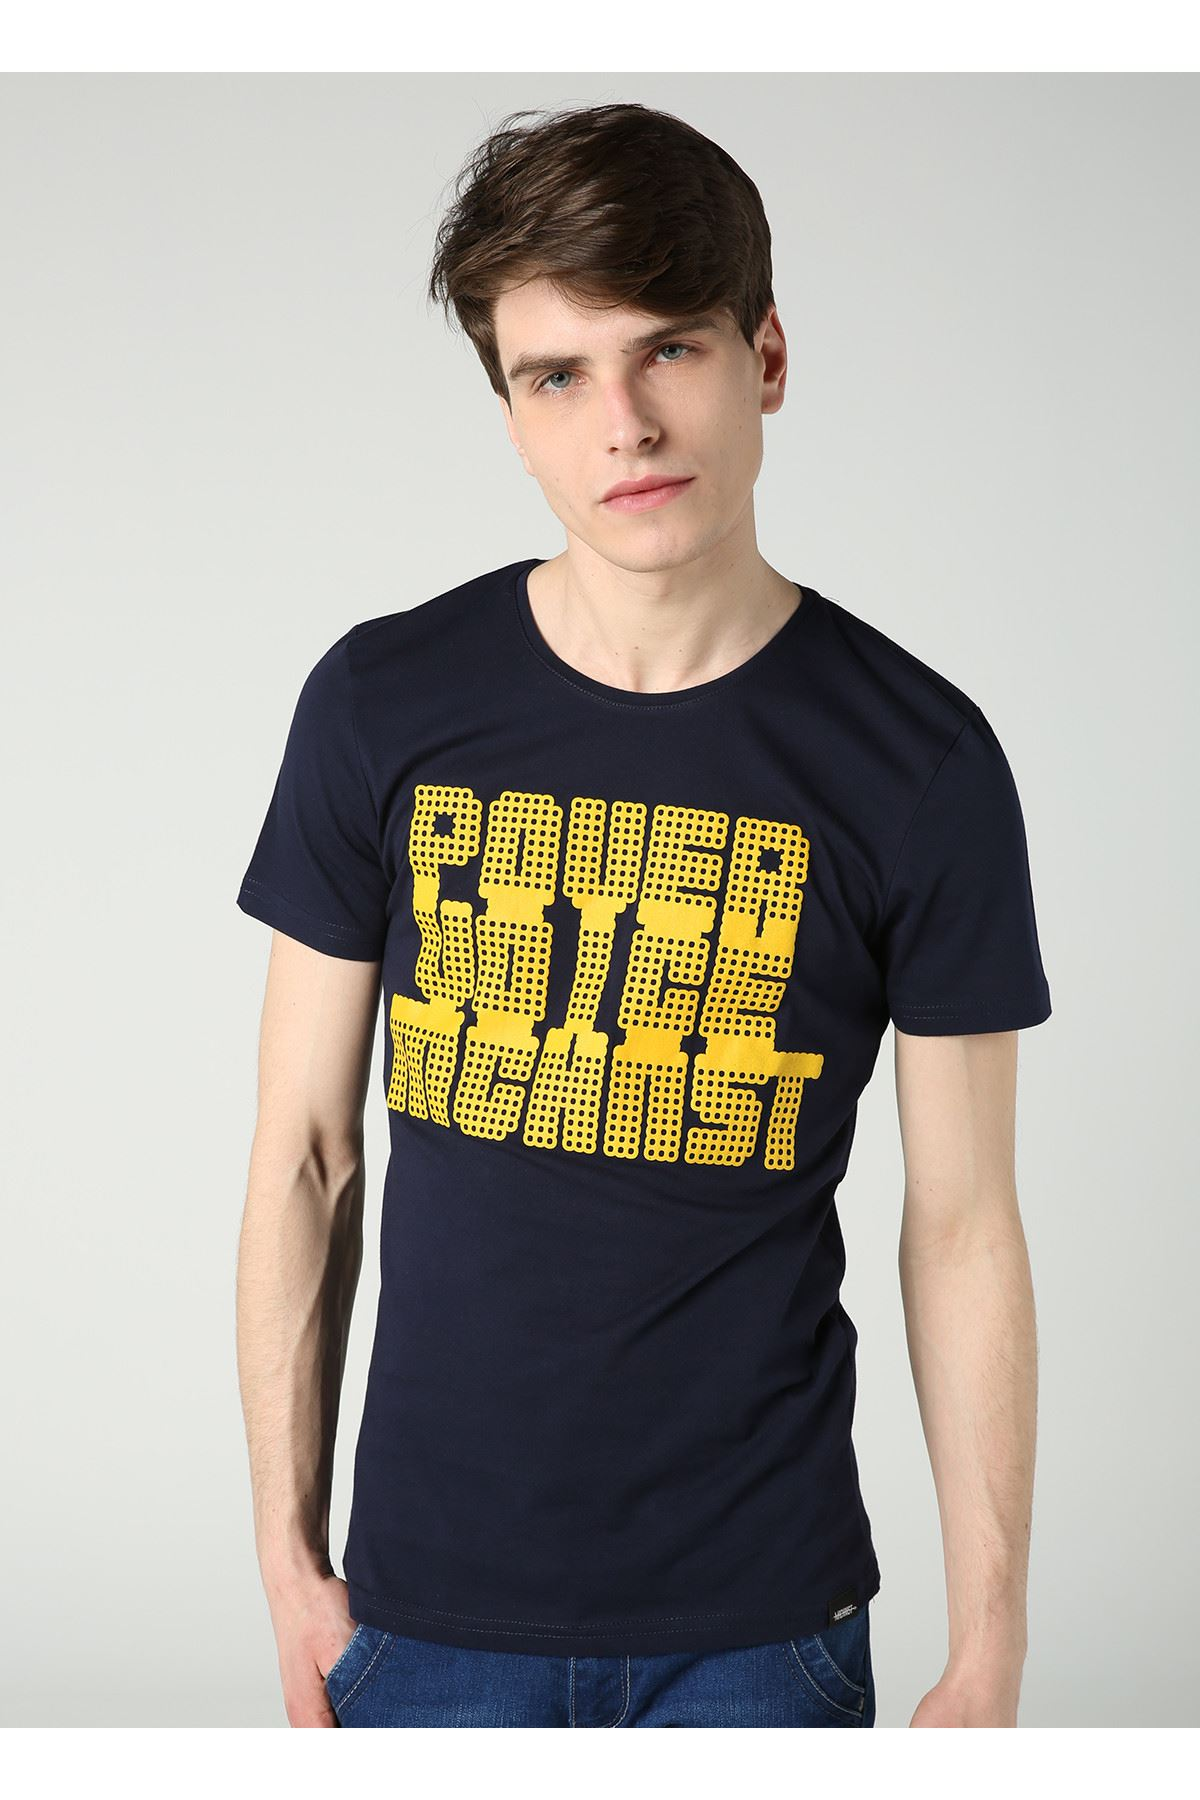 Bisiklet Yaka Power Baskılı Erkek Lacivert T-Shirt